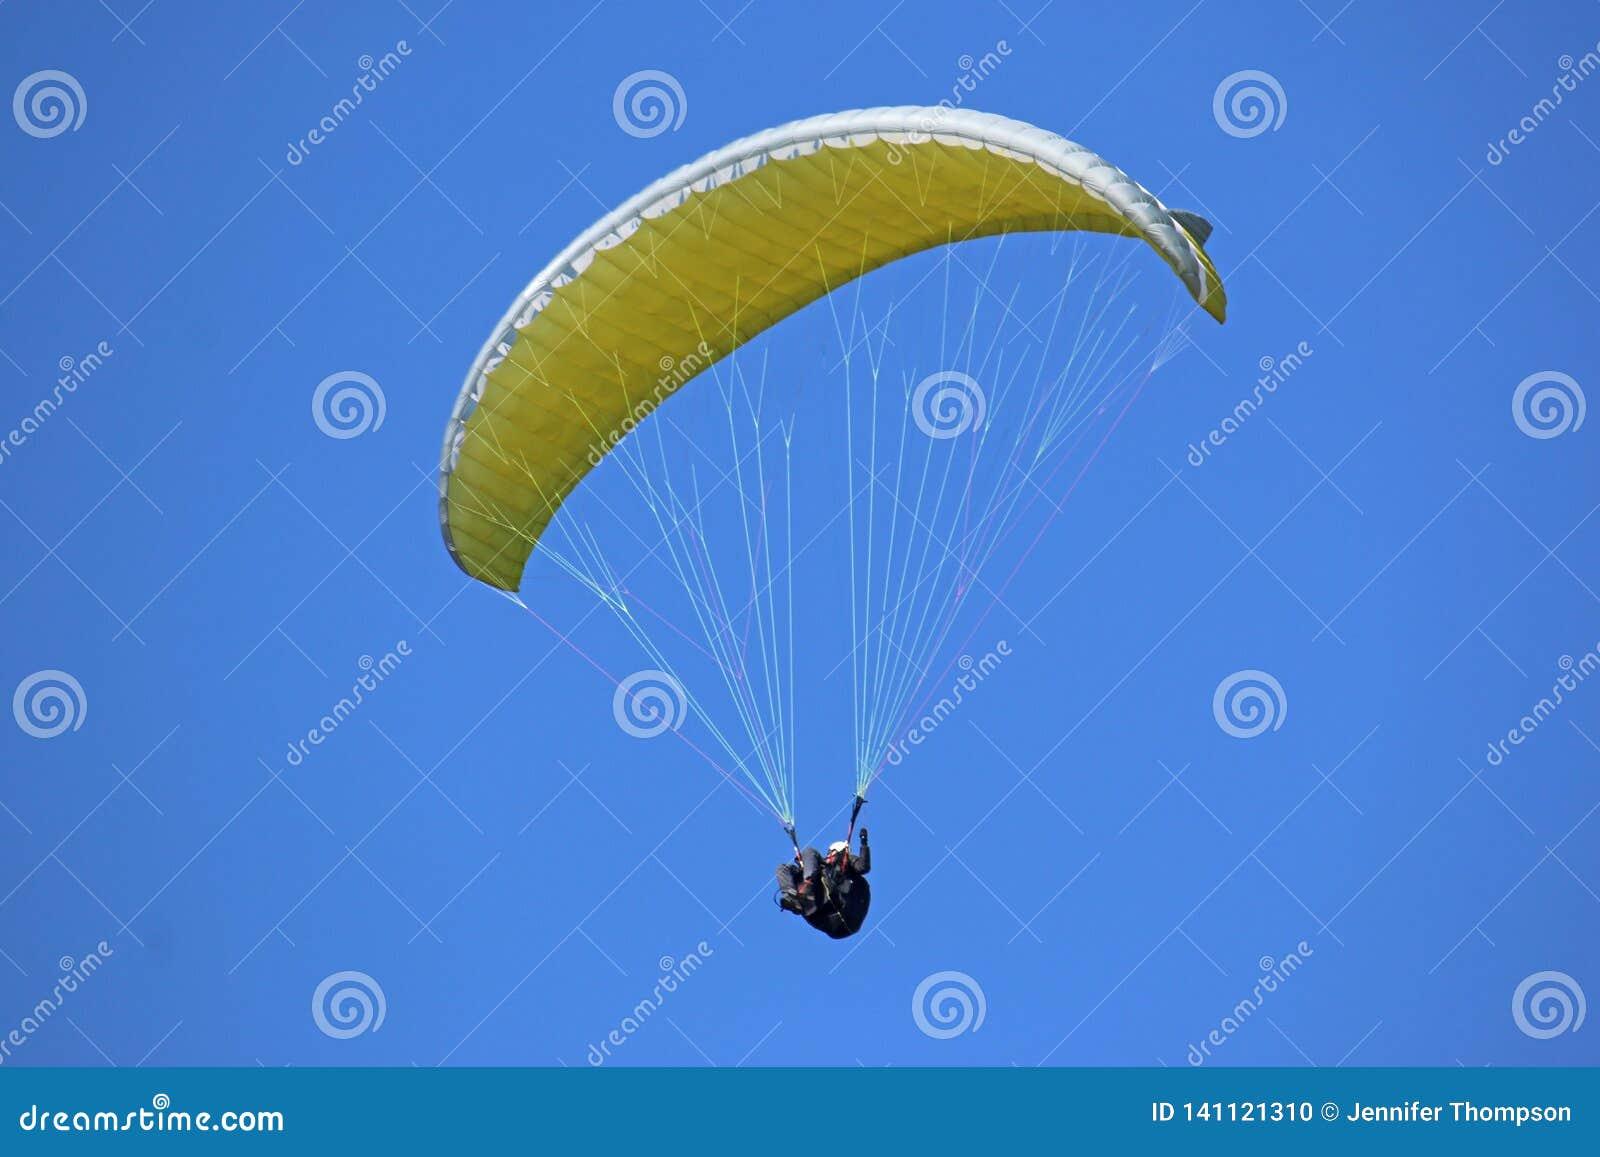 Paraglider koloru żółtego latający skrzydło